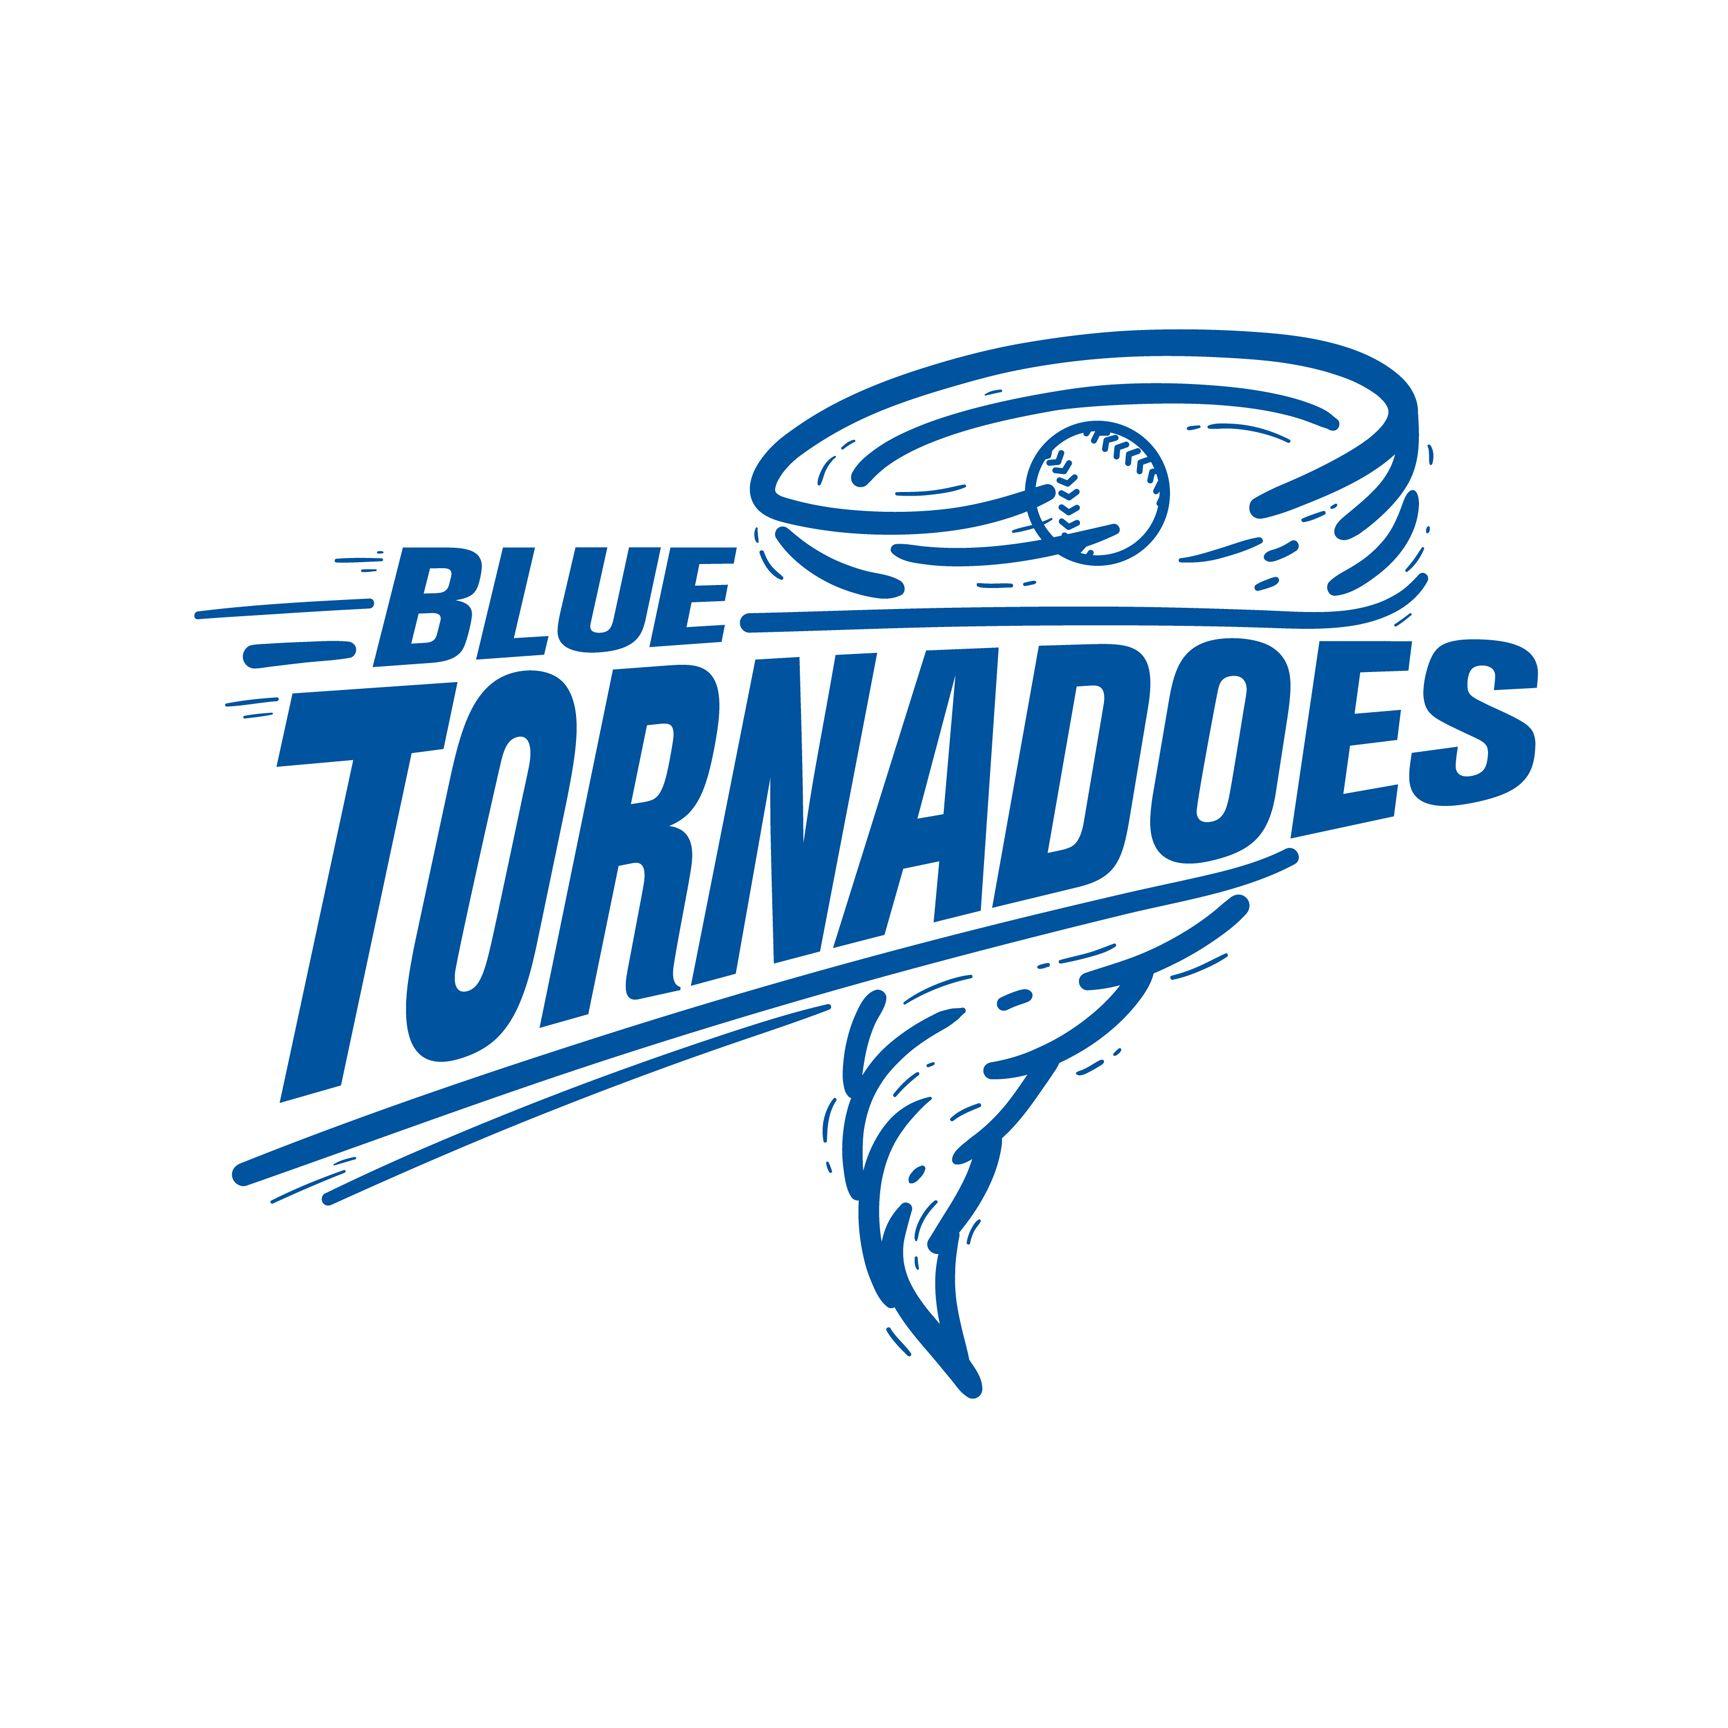 blue tornadoes logo for softball team other things softball logo design ideas Softball Logo Clip Art